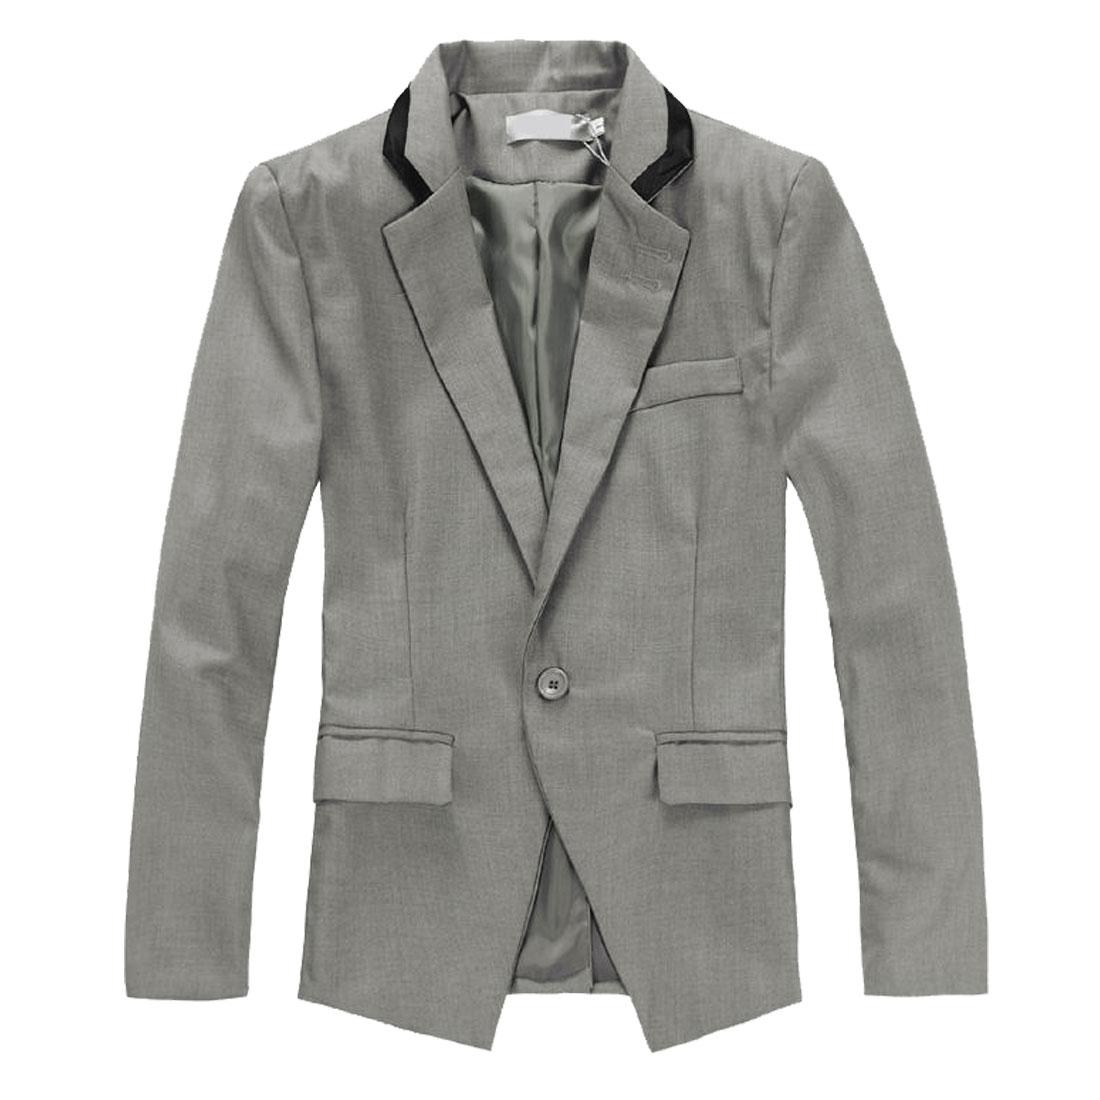 Mens Gray Trendy Padded Shoulder Single Button Closure Patch Pockets Blazer M